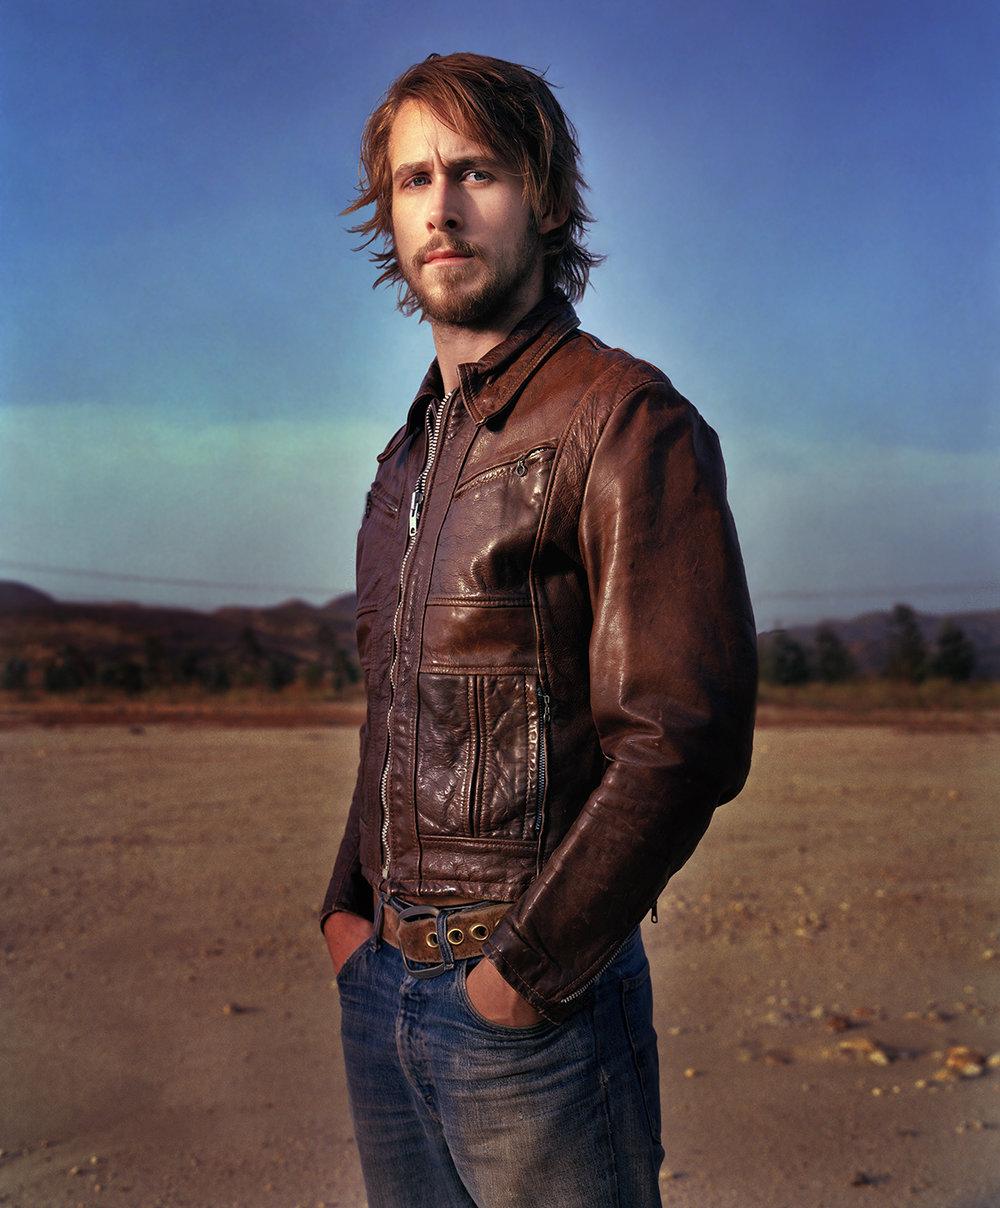 Ryan_Gosling_ContourPhotos_5037524.jpg